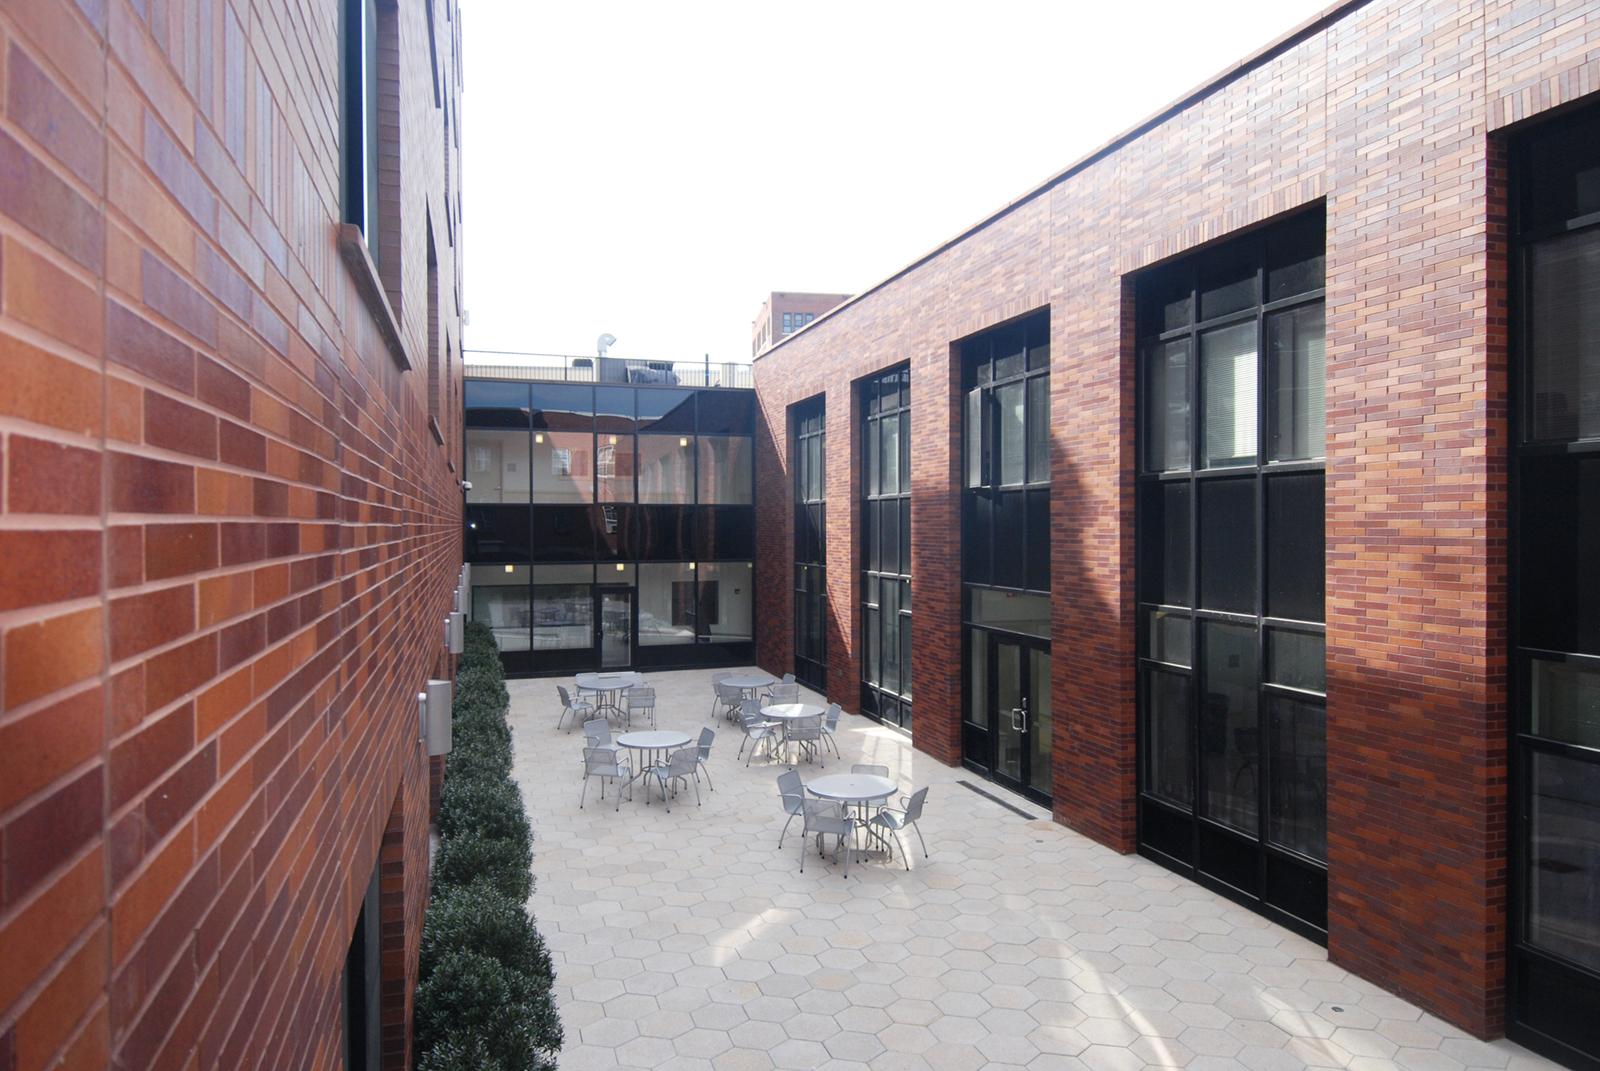 Hughes courtyard. Image Credit: Adrian Vasile